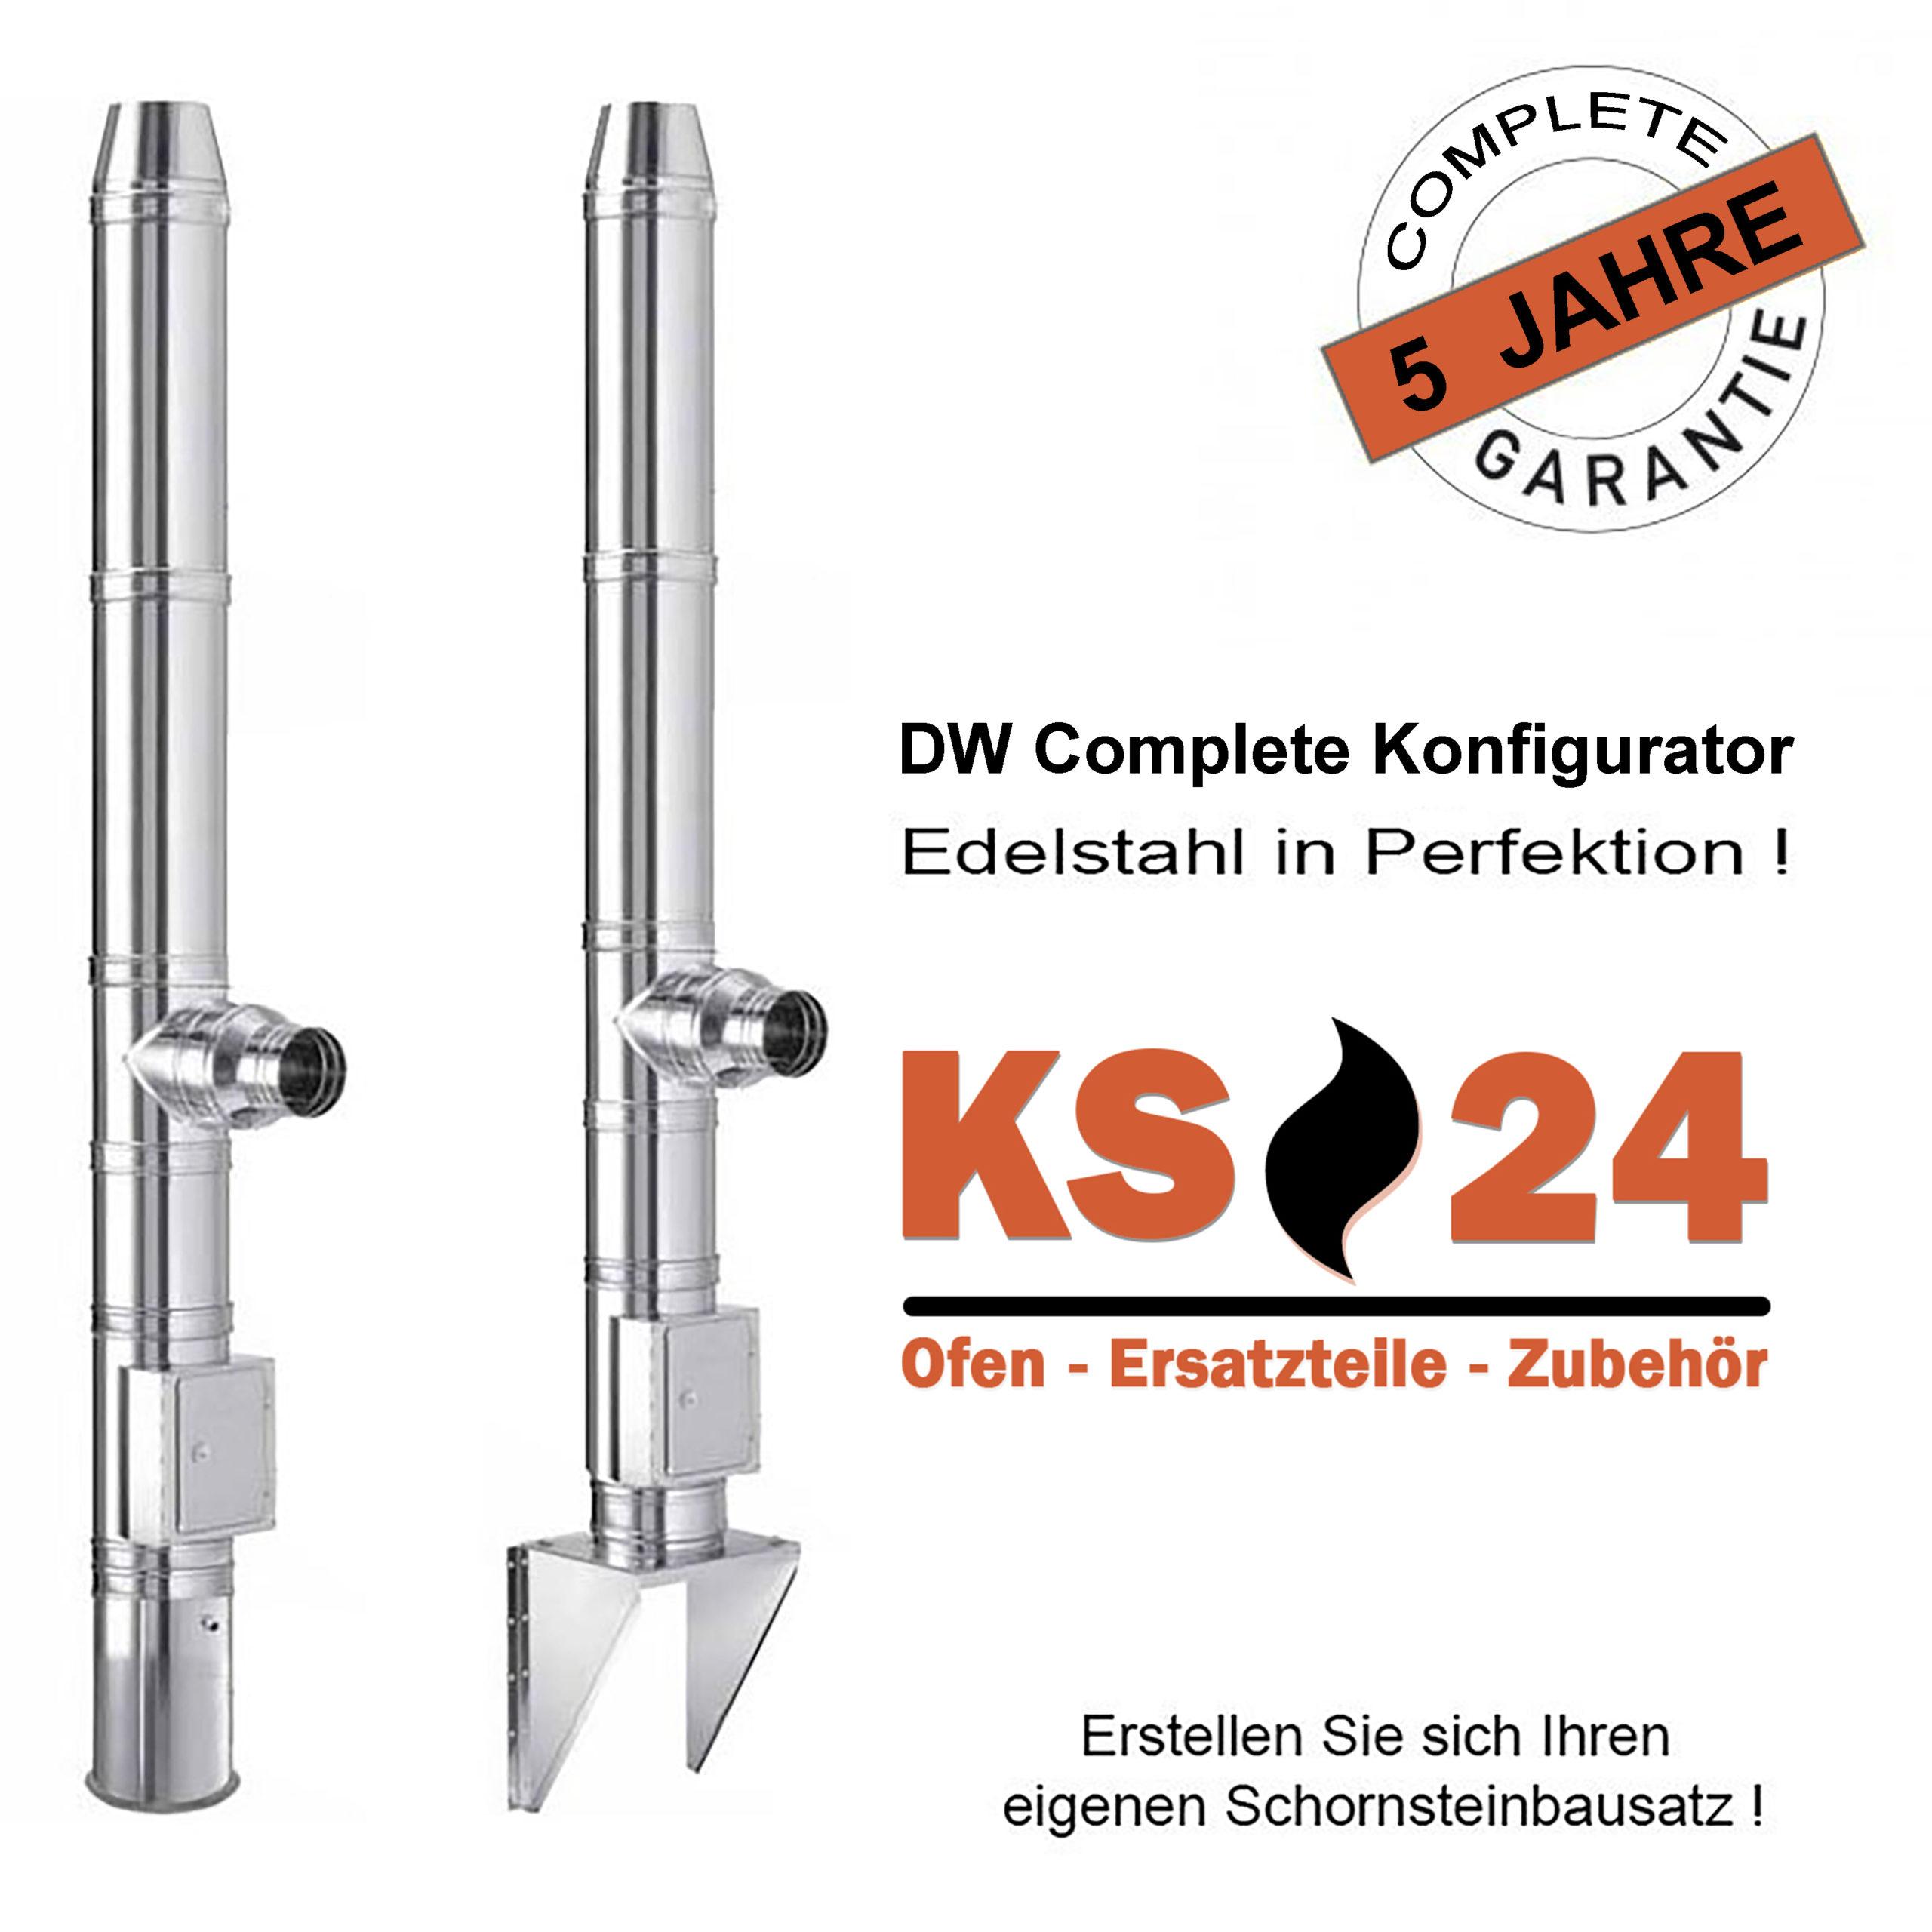 KS24 DW-Complete